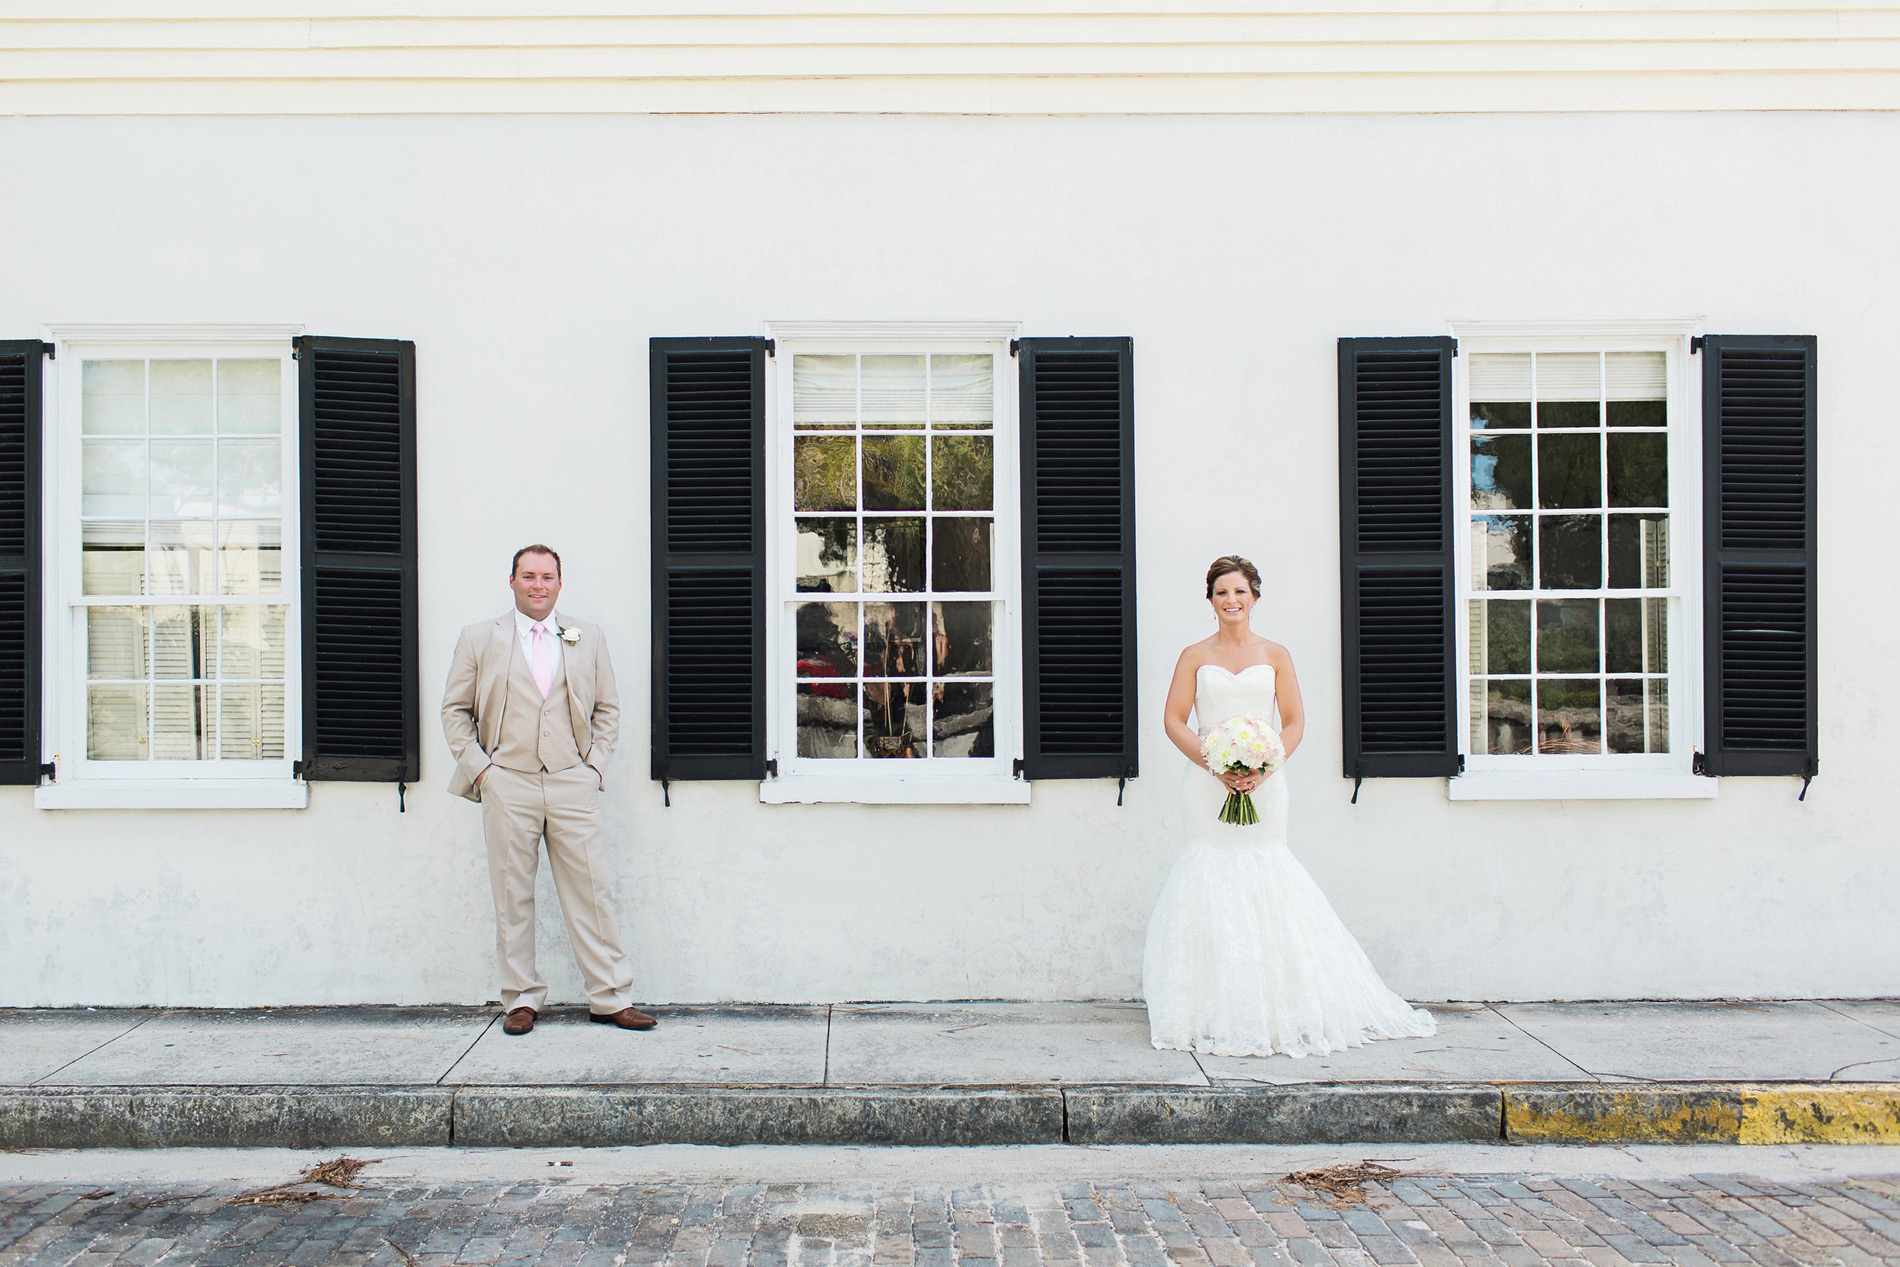 st-augustine-wedding-white-room-historic-building